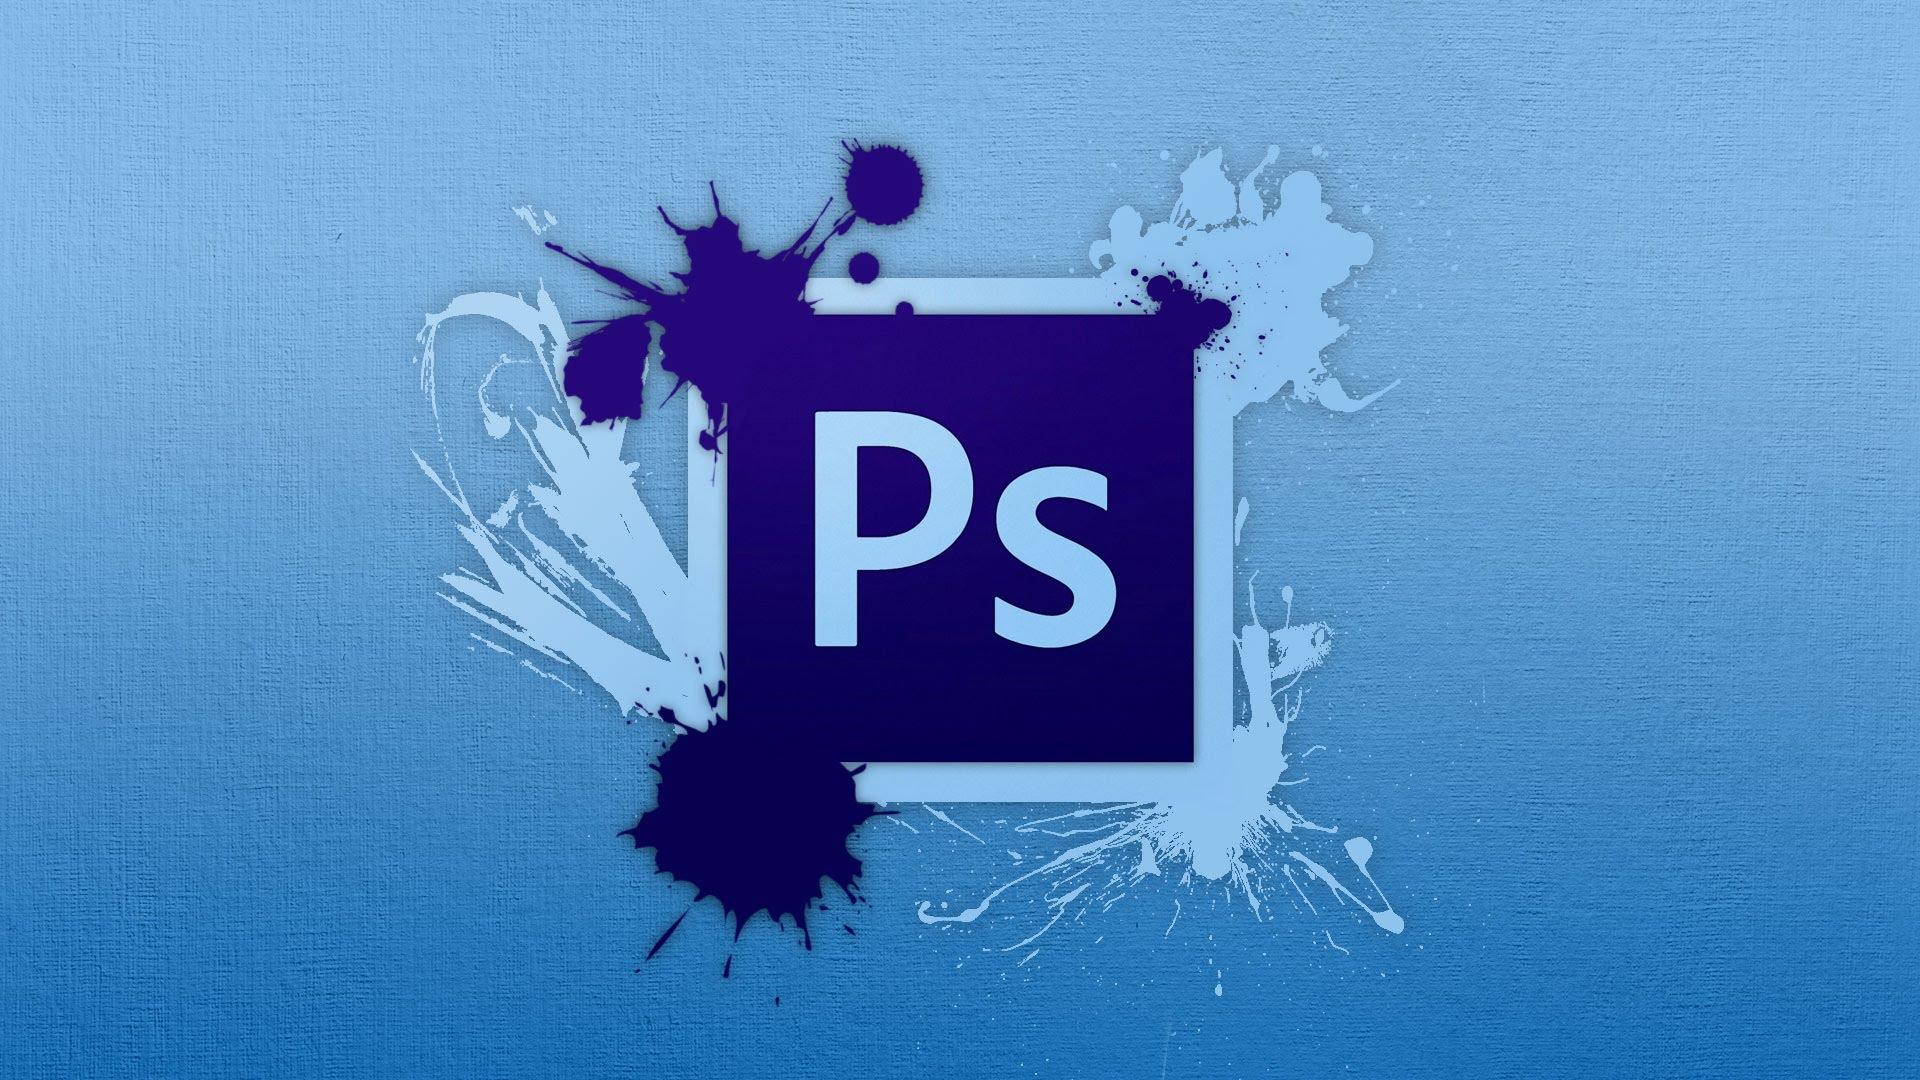 Efecto graffiti en Adobe Photoshop